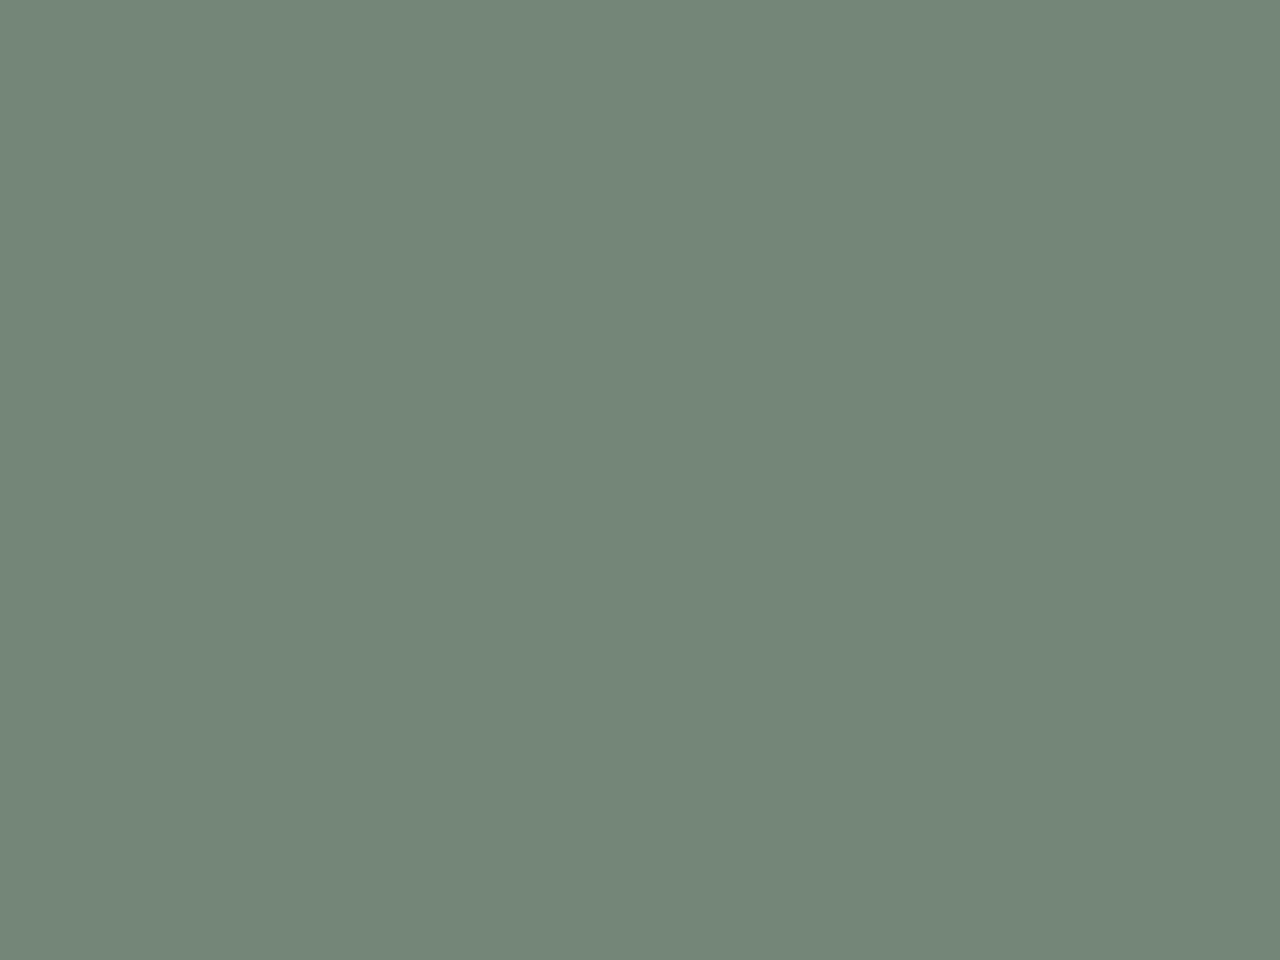 1280x960 Xanadu Solid Color Background